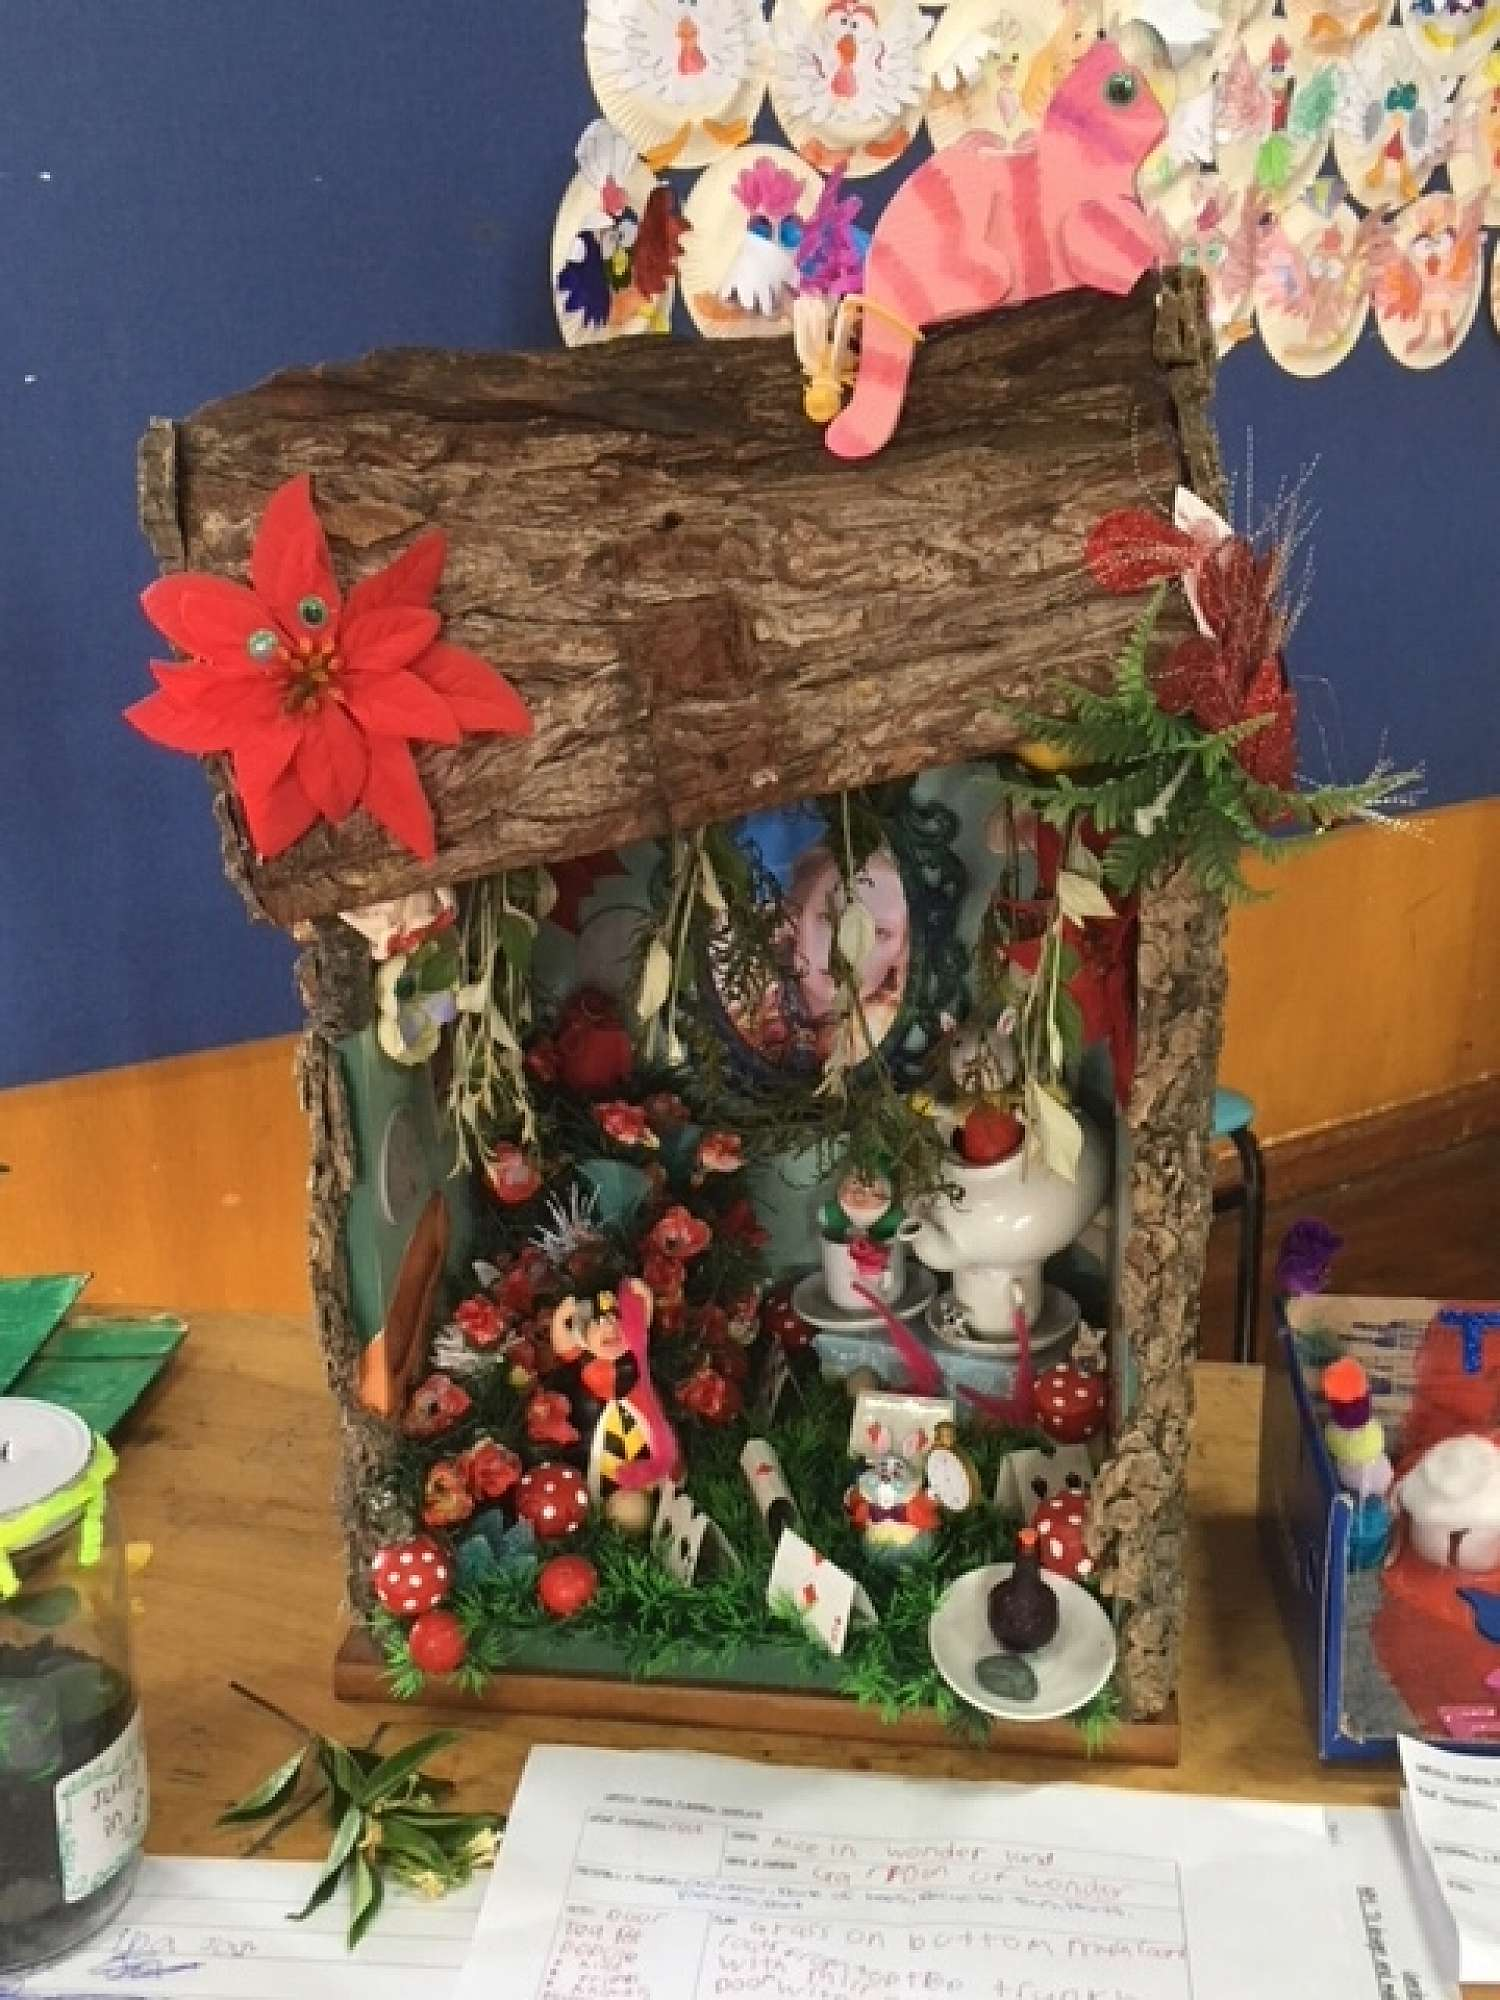 Christmas Shoebox Diorama.Amazing Dioramas Alice In Wonderland To The 4 Seasons